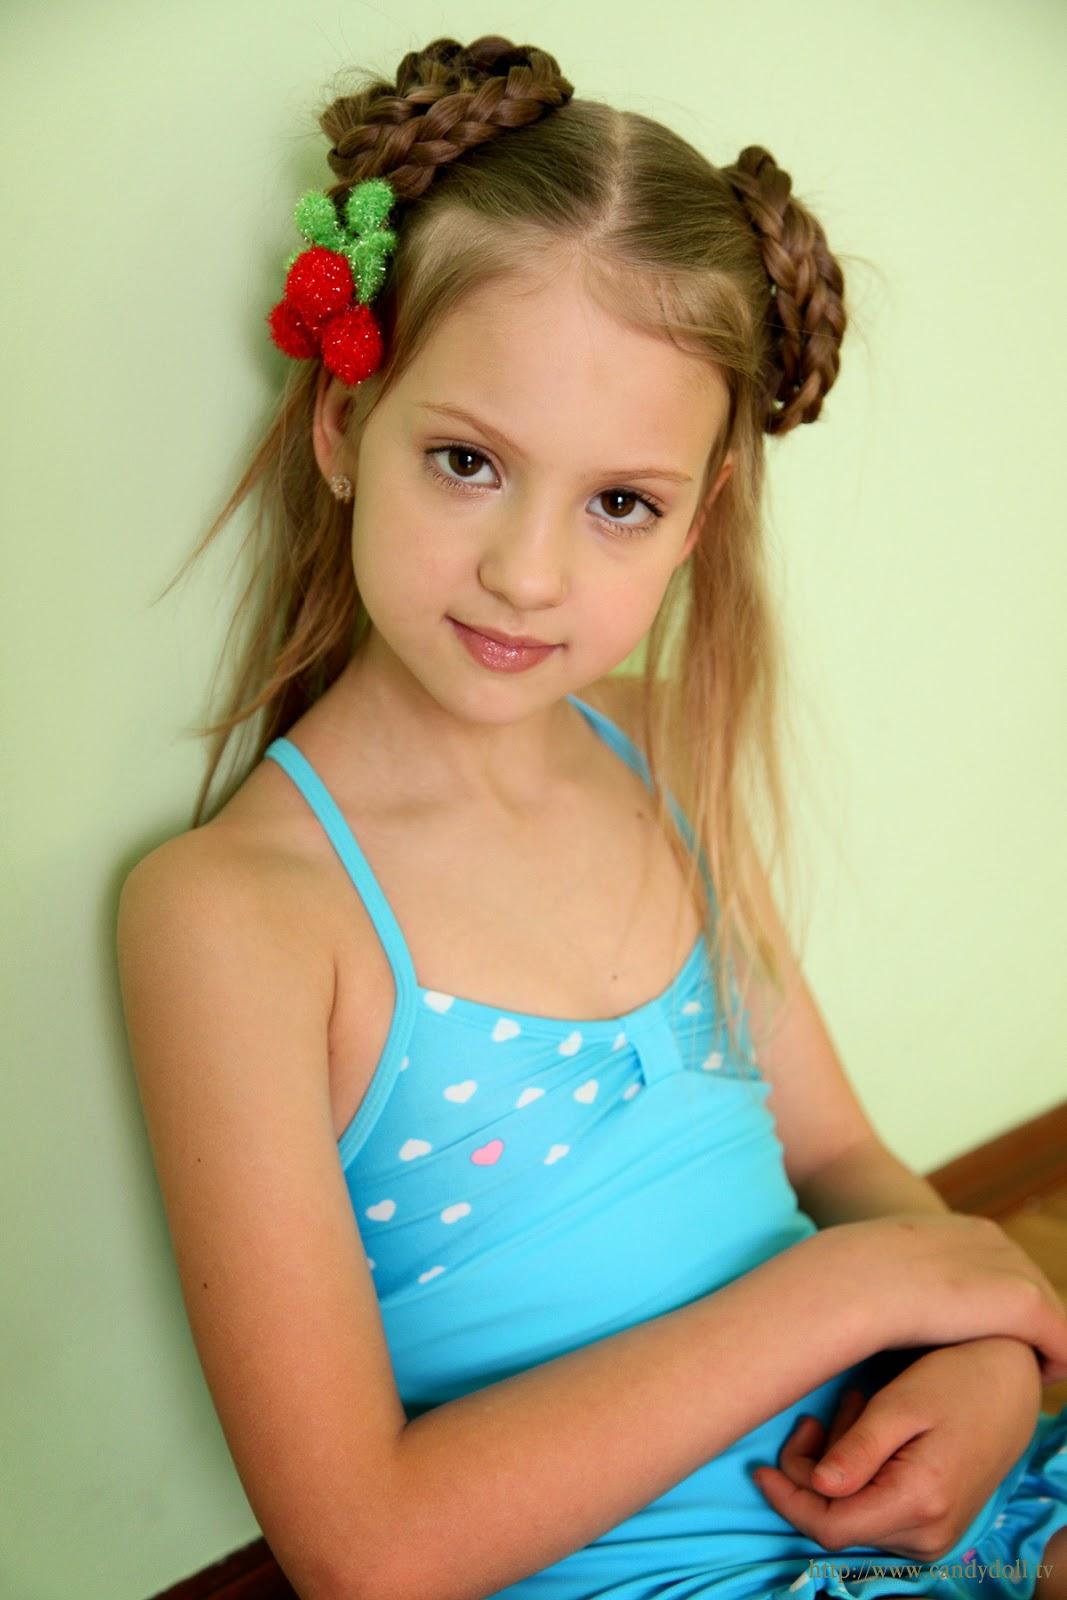 Valensiya Candydoll TV Teen Model